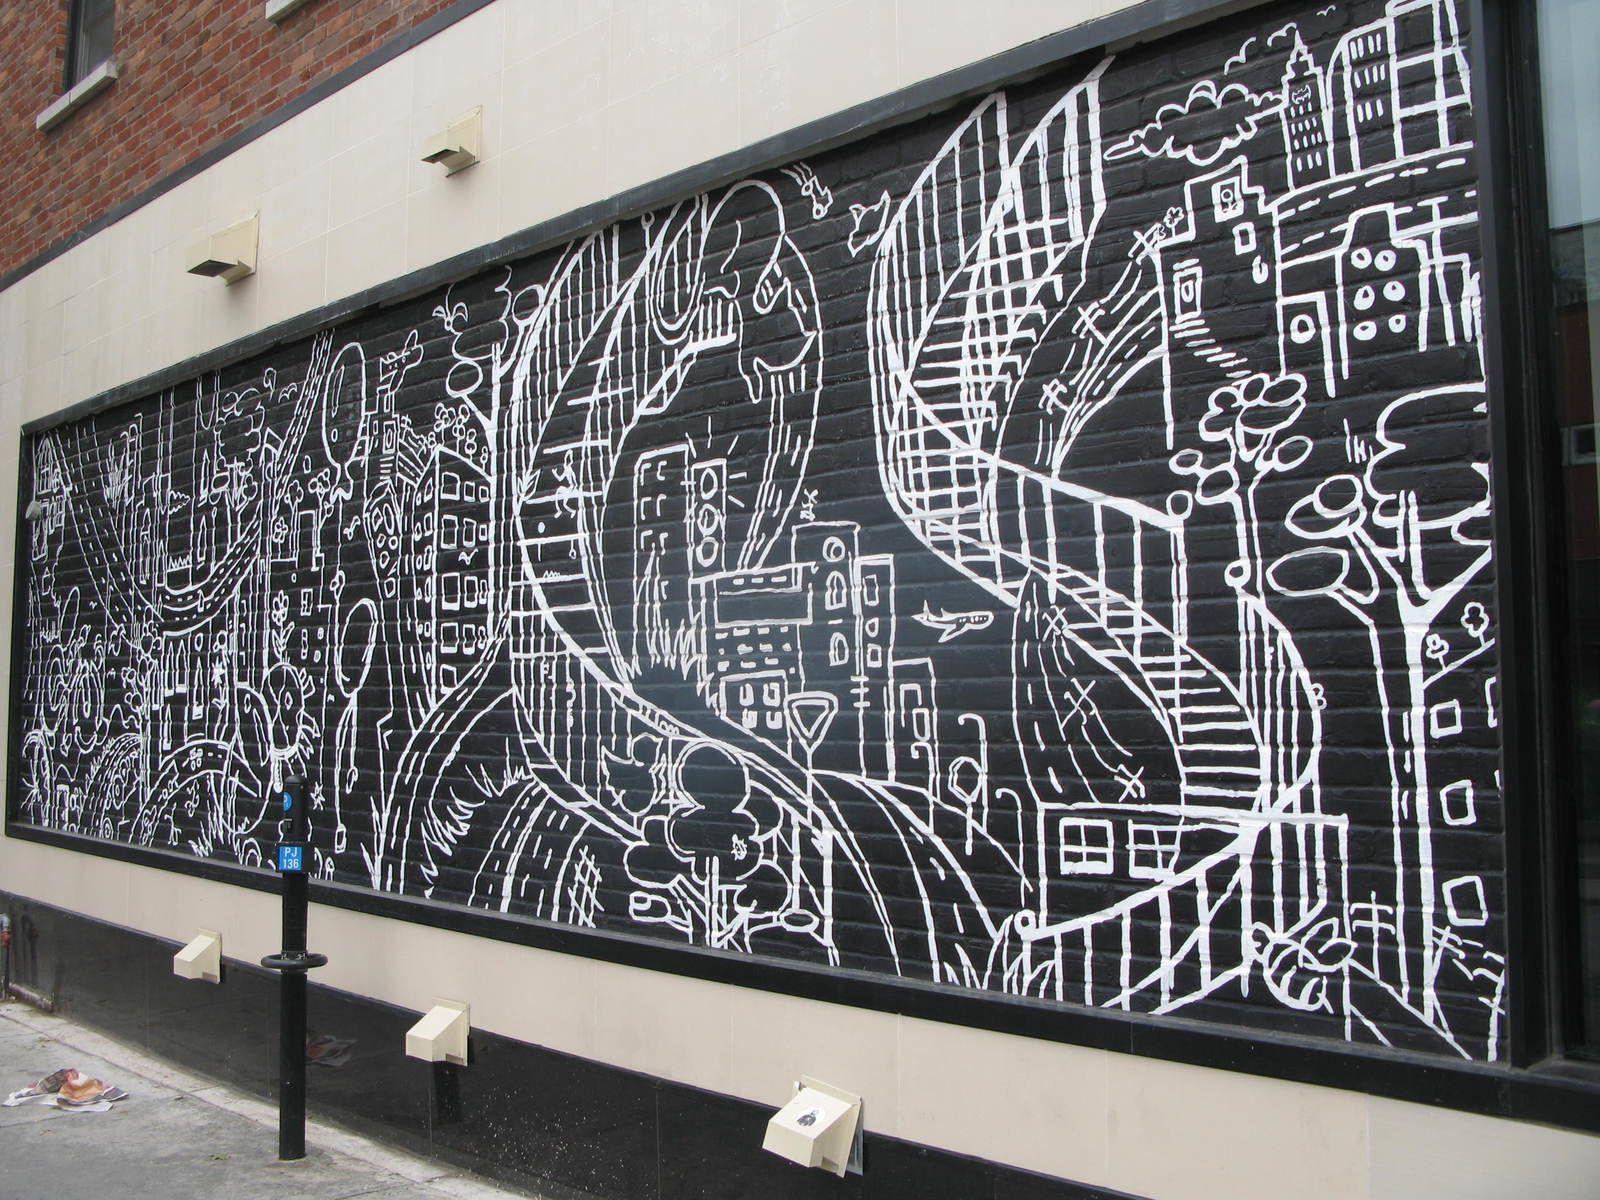 art de la rue- Montreal-canada- charlotteblabla blog*